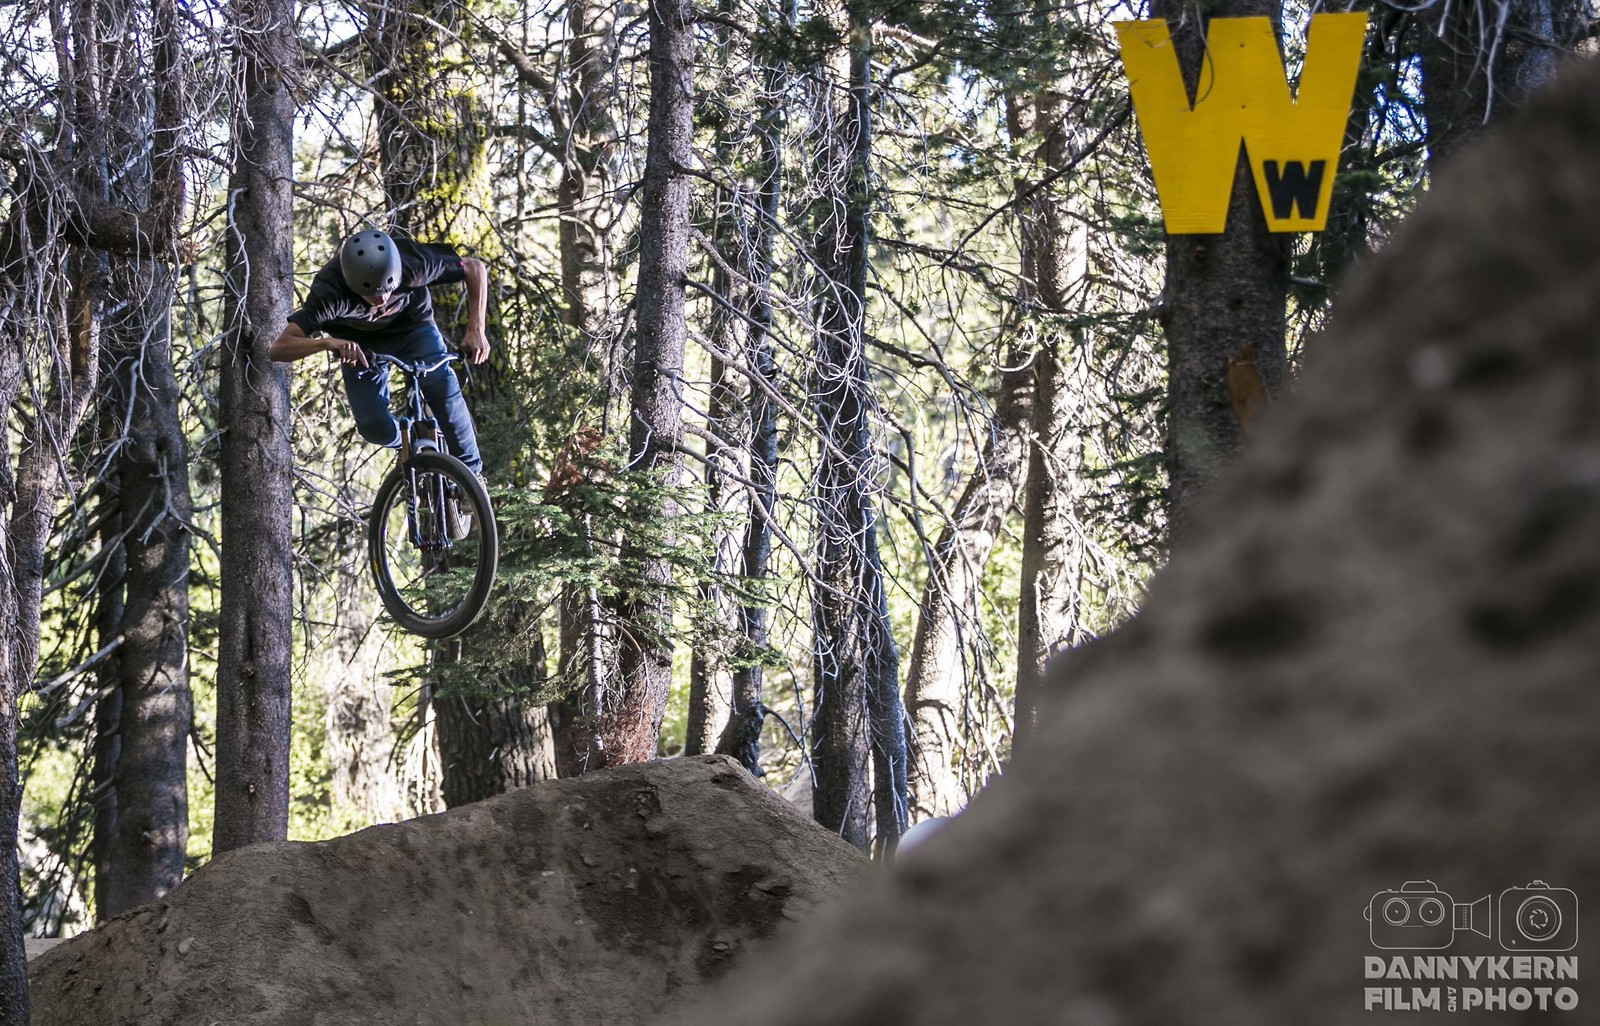 Summer2013 WK5 9 copy - Christian - Mountain Biking Pictures - Vital MTB